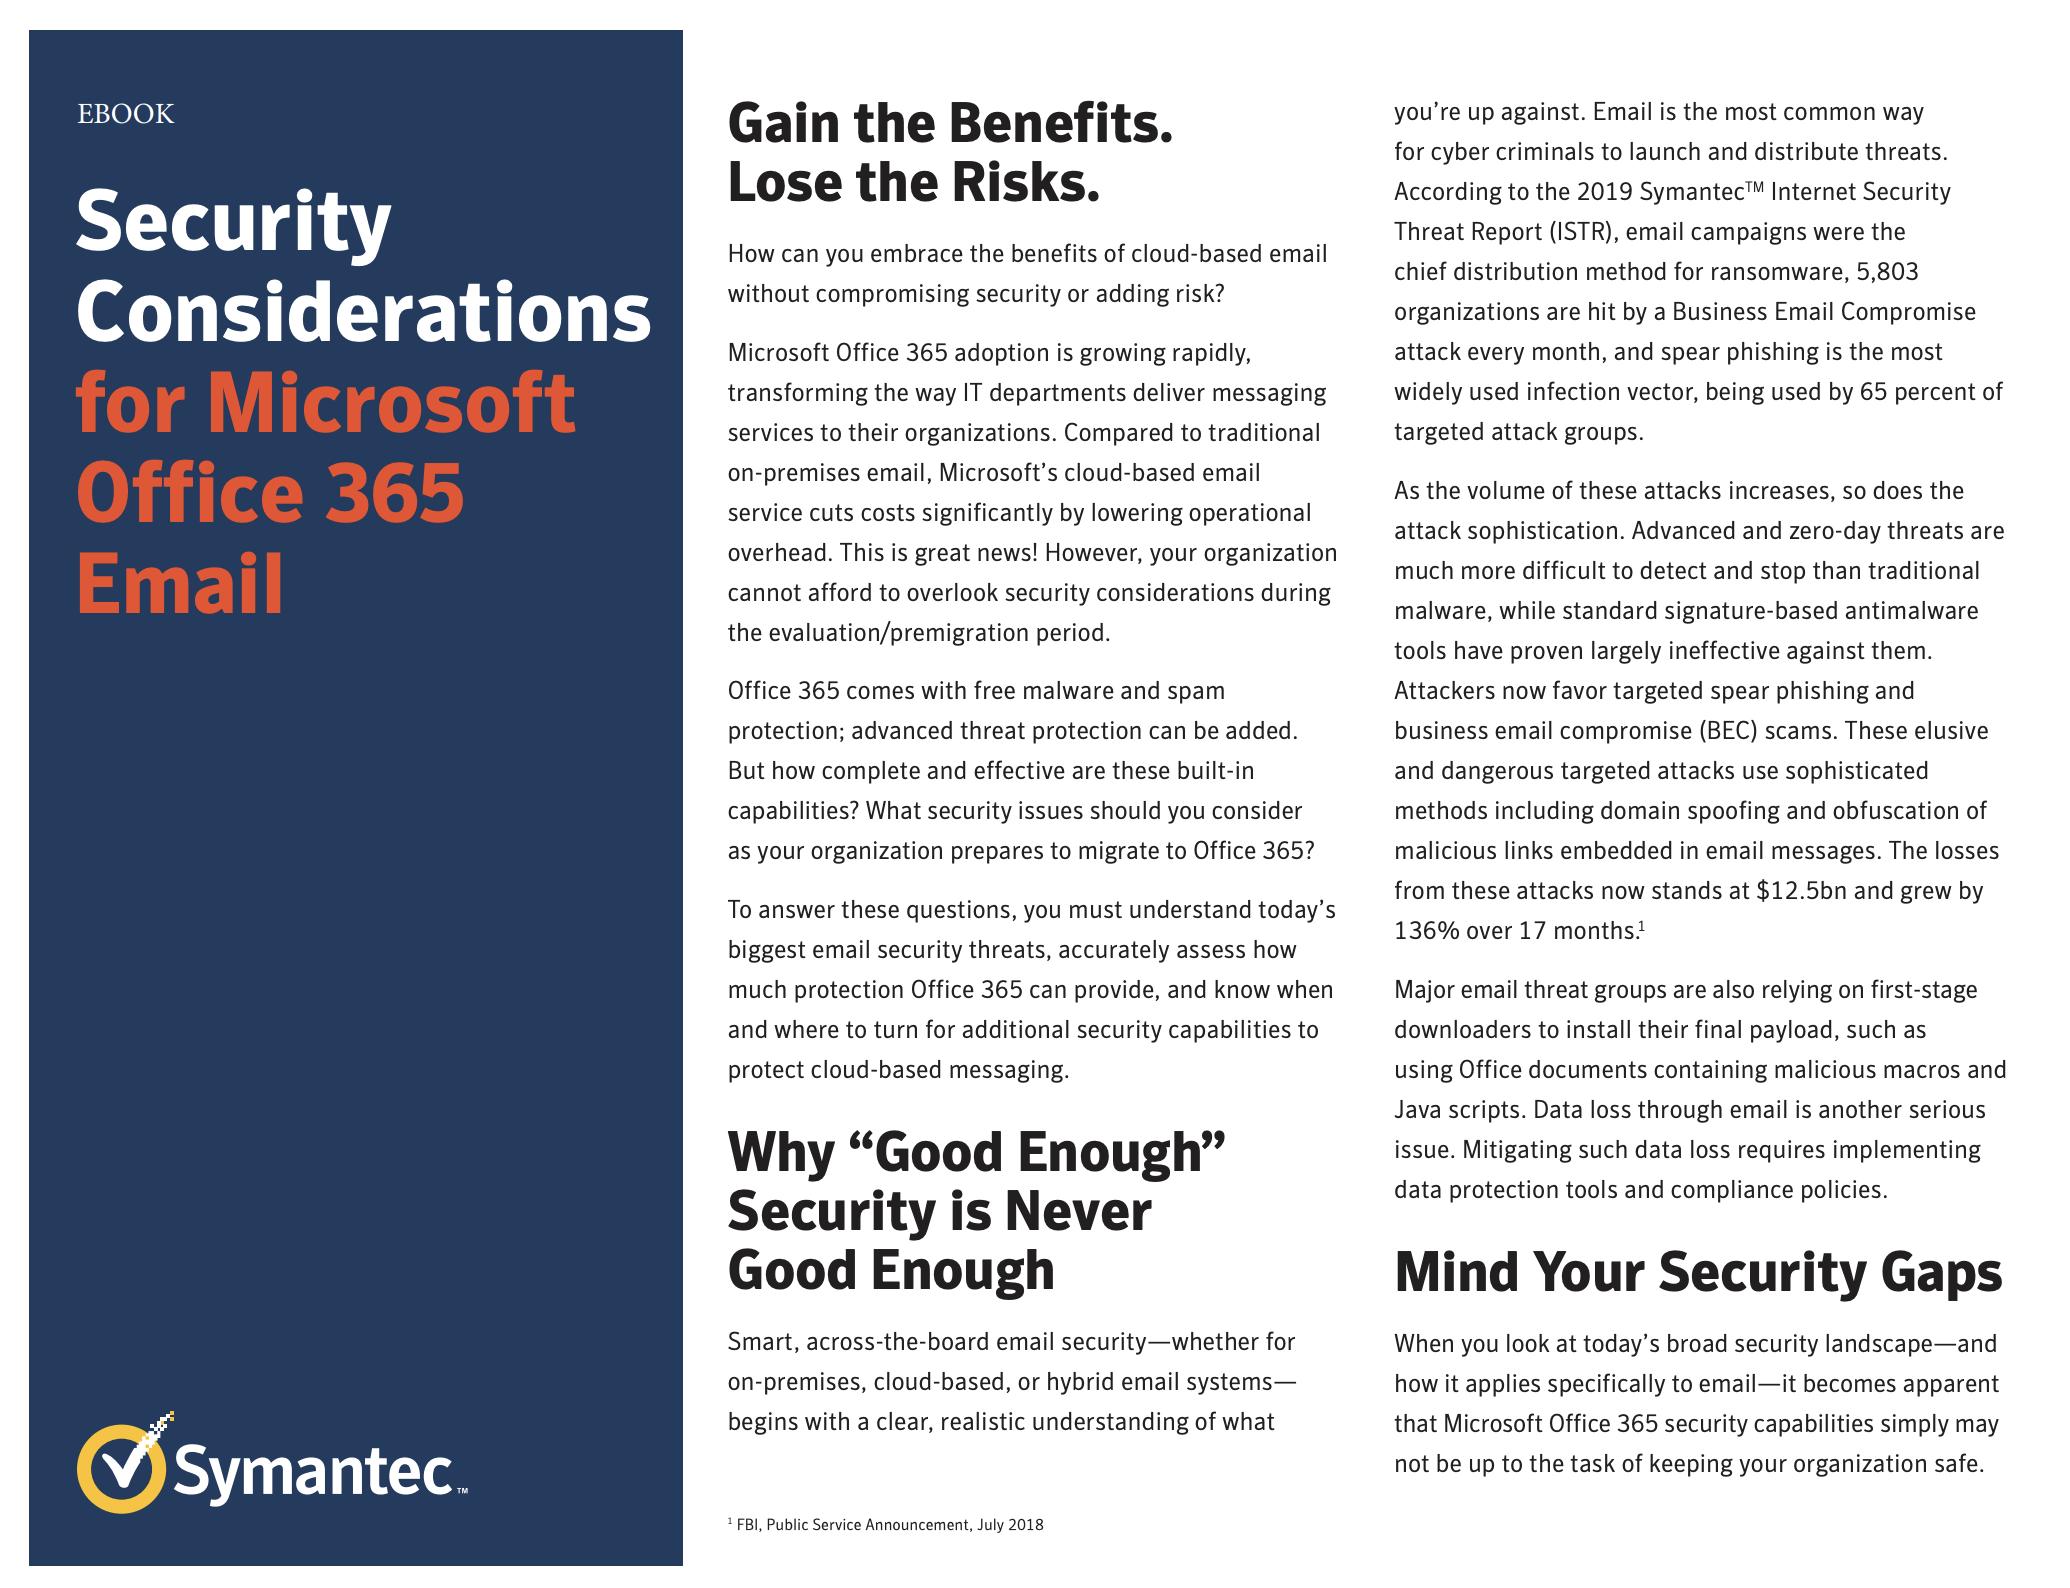 Symantec email threats eBook cover